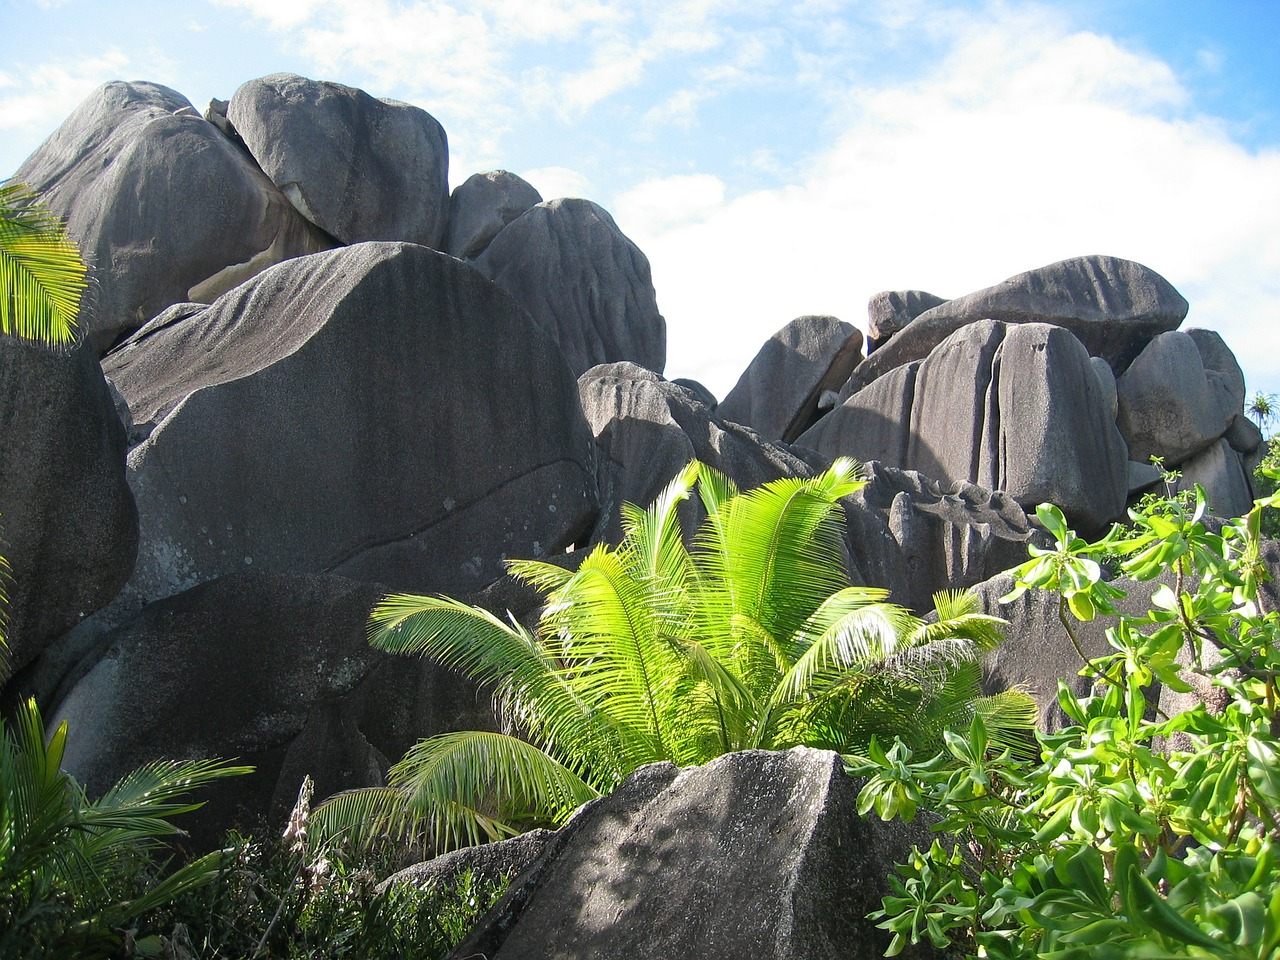 seychelles-168879_1280